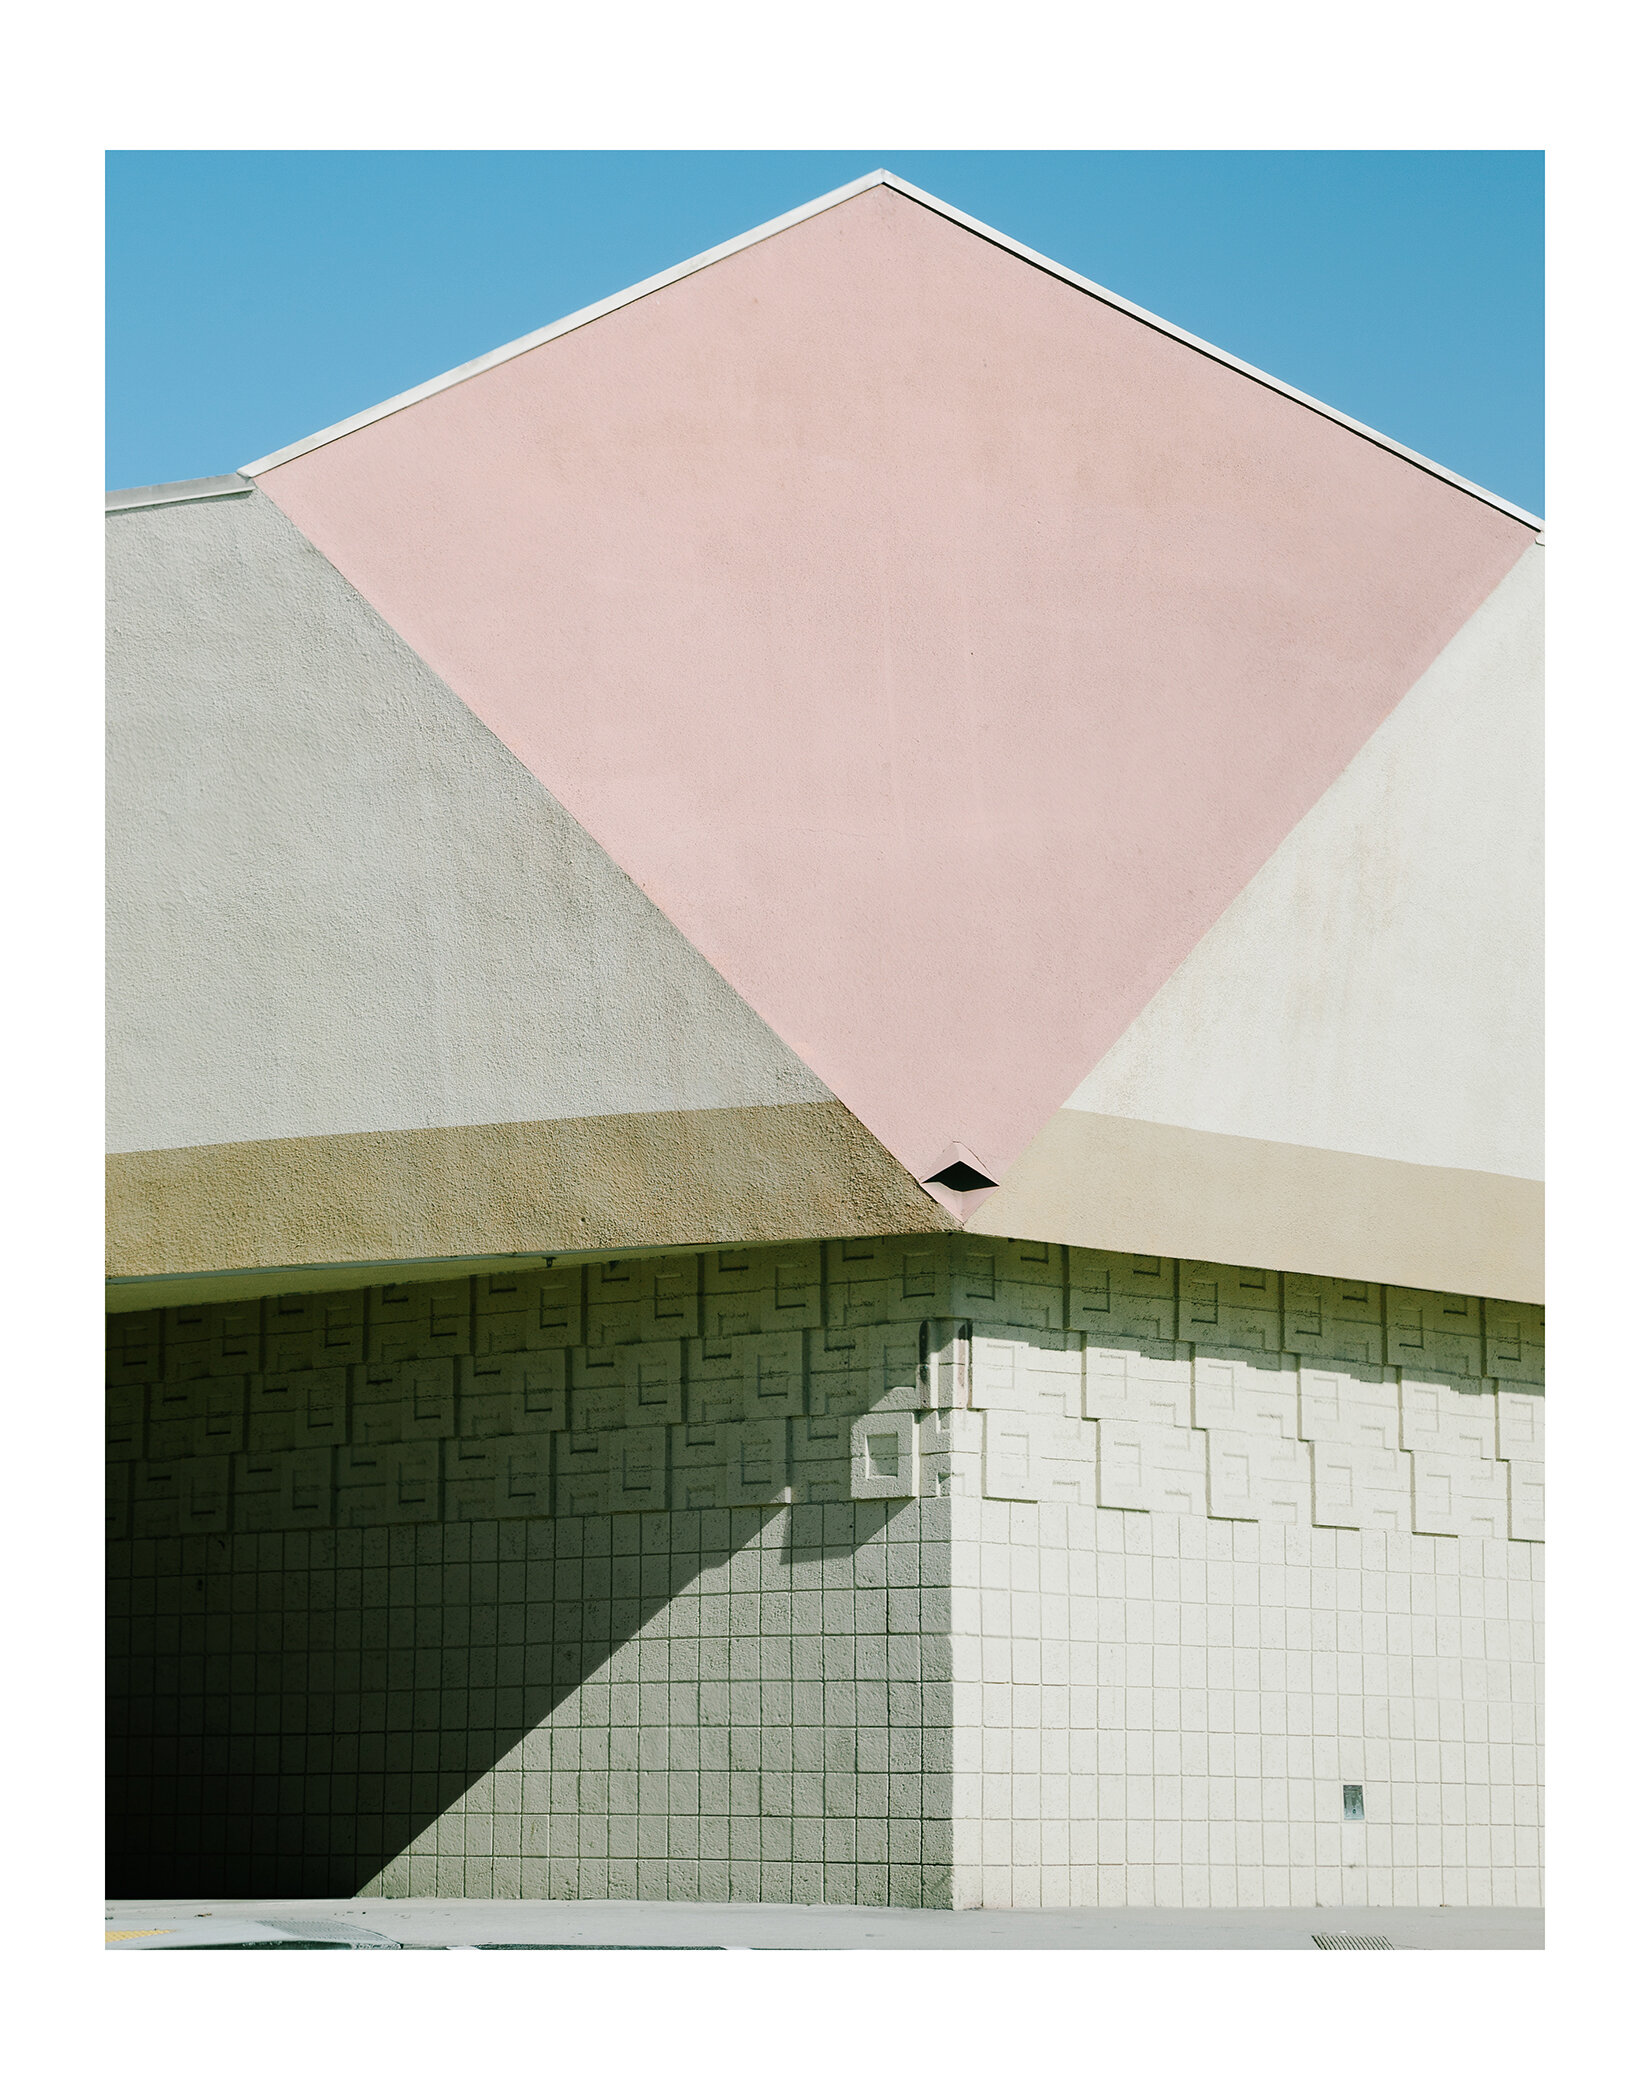 Solo Show, Basic Shapes/Huntington Beach, CA - Rachelle Mendez